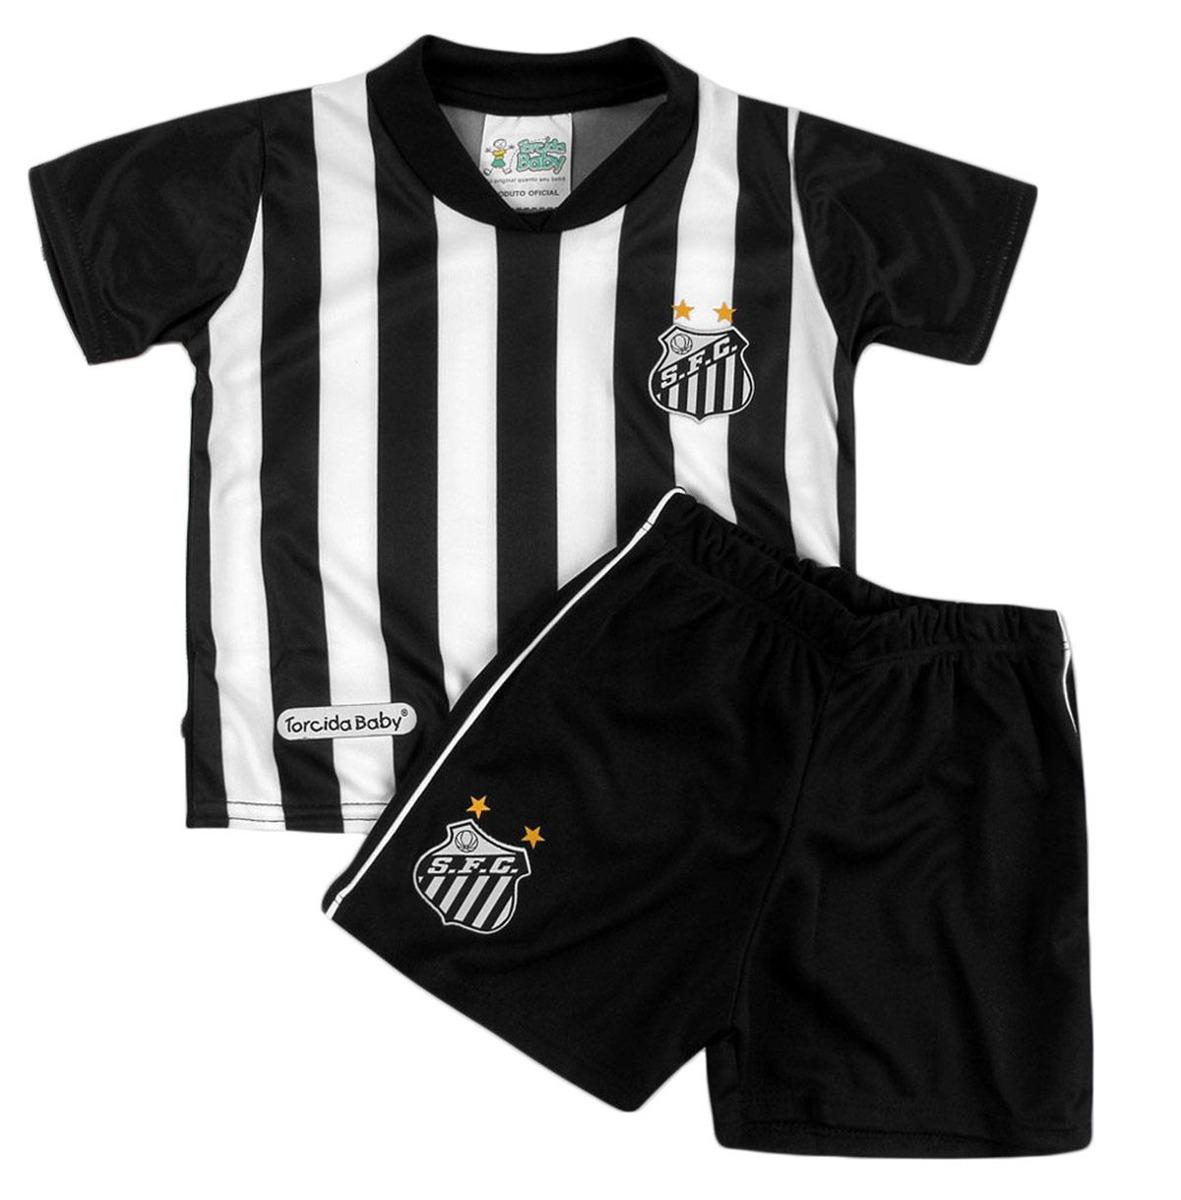 camisa infantil santos + shorts torcida baby micro dry c nf. Carregando  zoom. 20eab565cdaf7